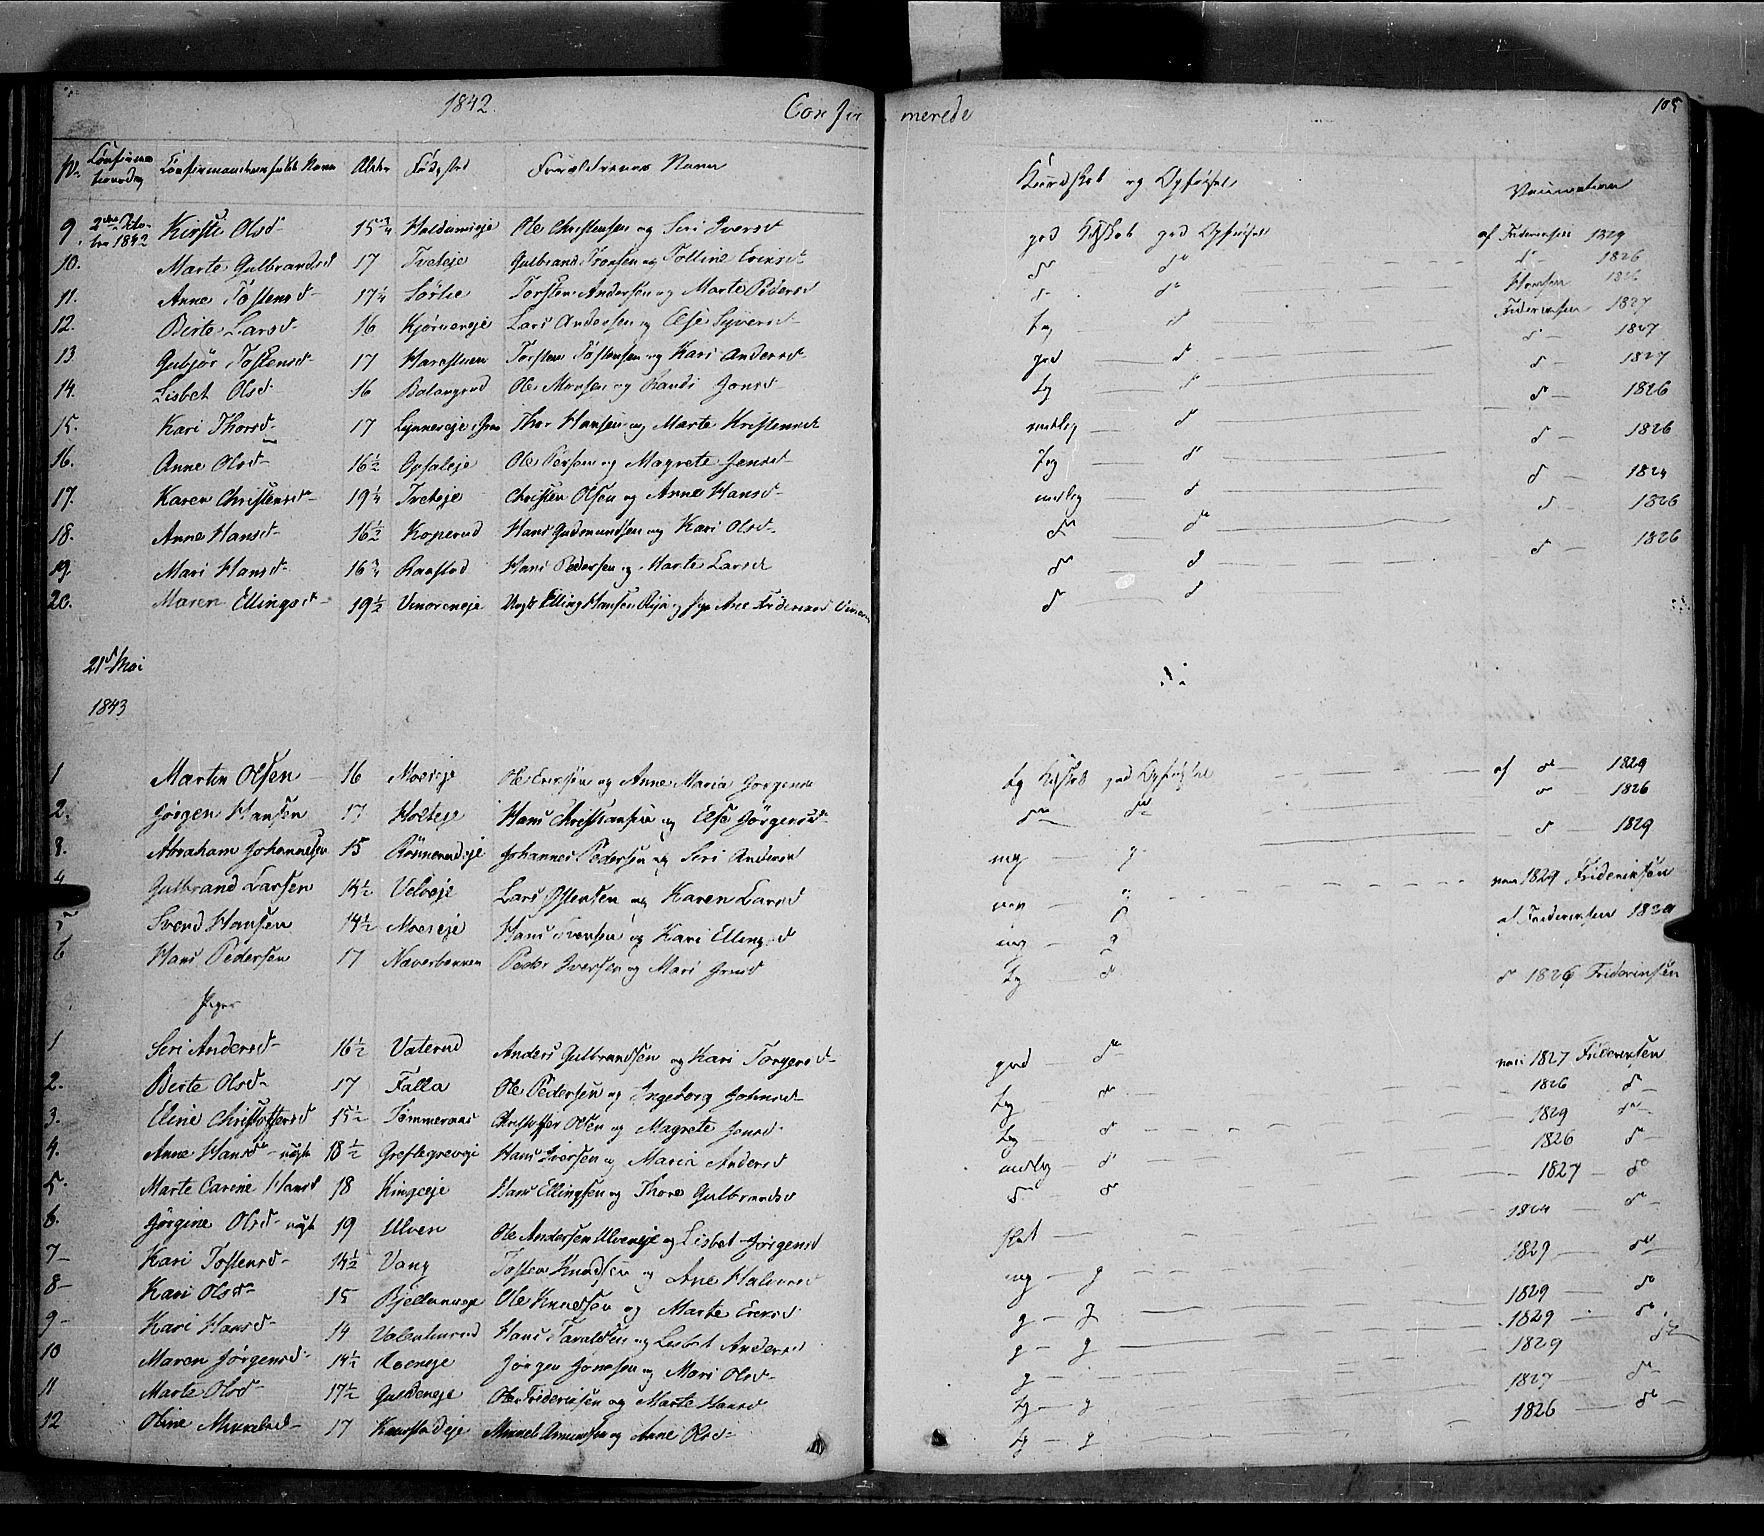 SAH, Jevnaker prestekontor, Ministerialbok nr. 6, 1837-1857, s. 105